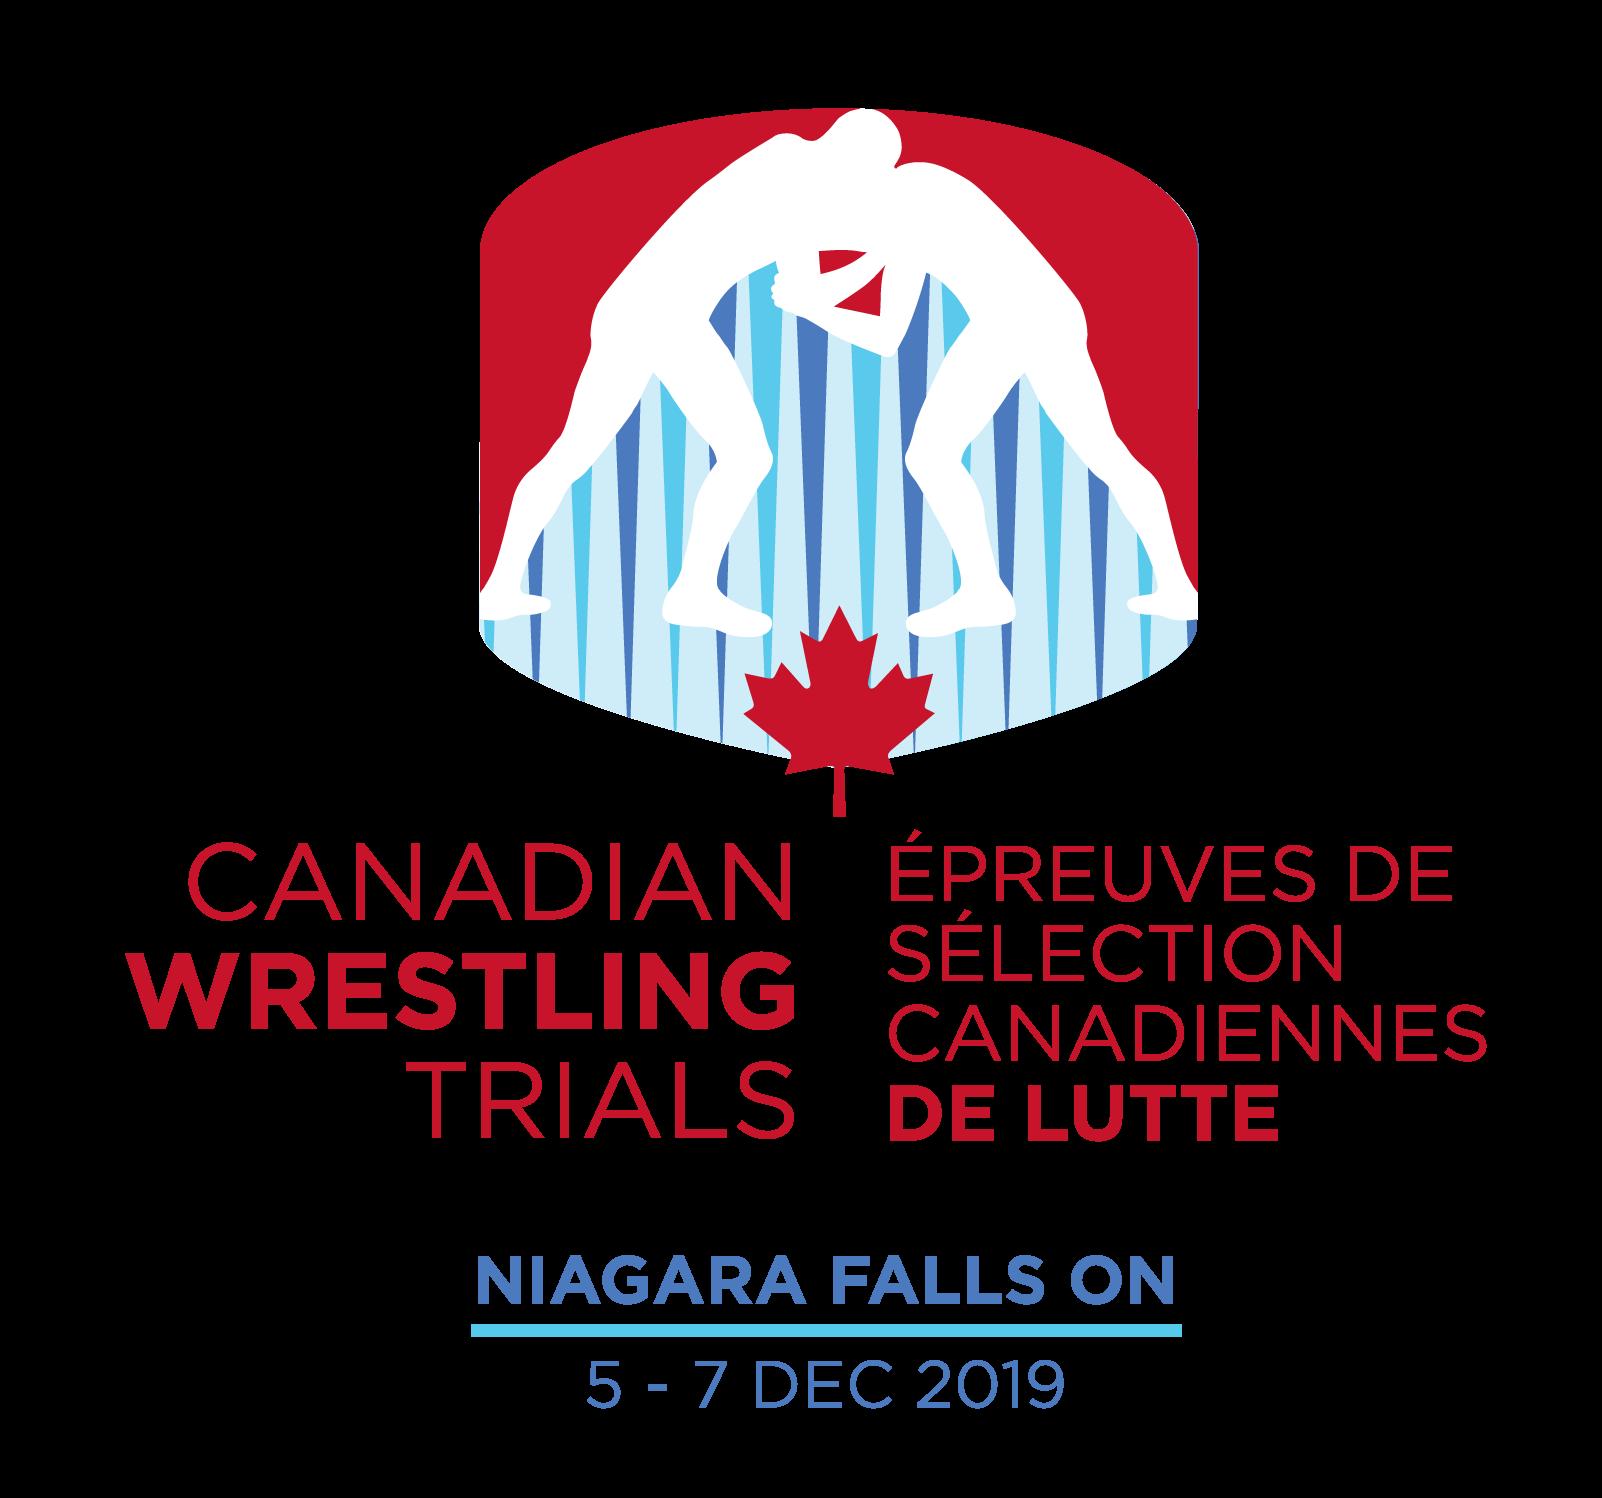 2019 Canadian Wrestling Trials - ATHLETE REGISTRATION